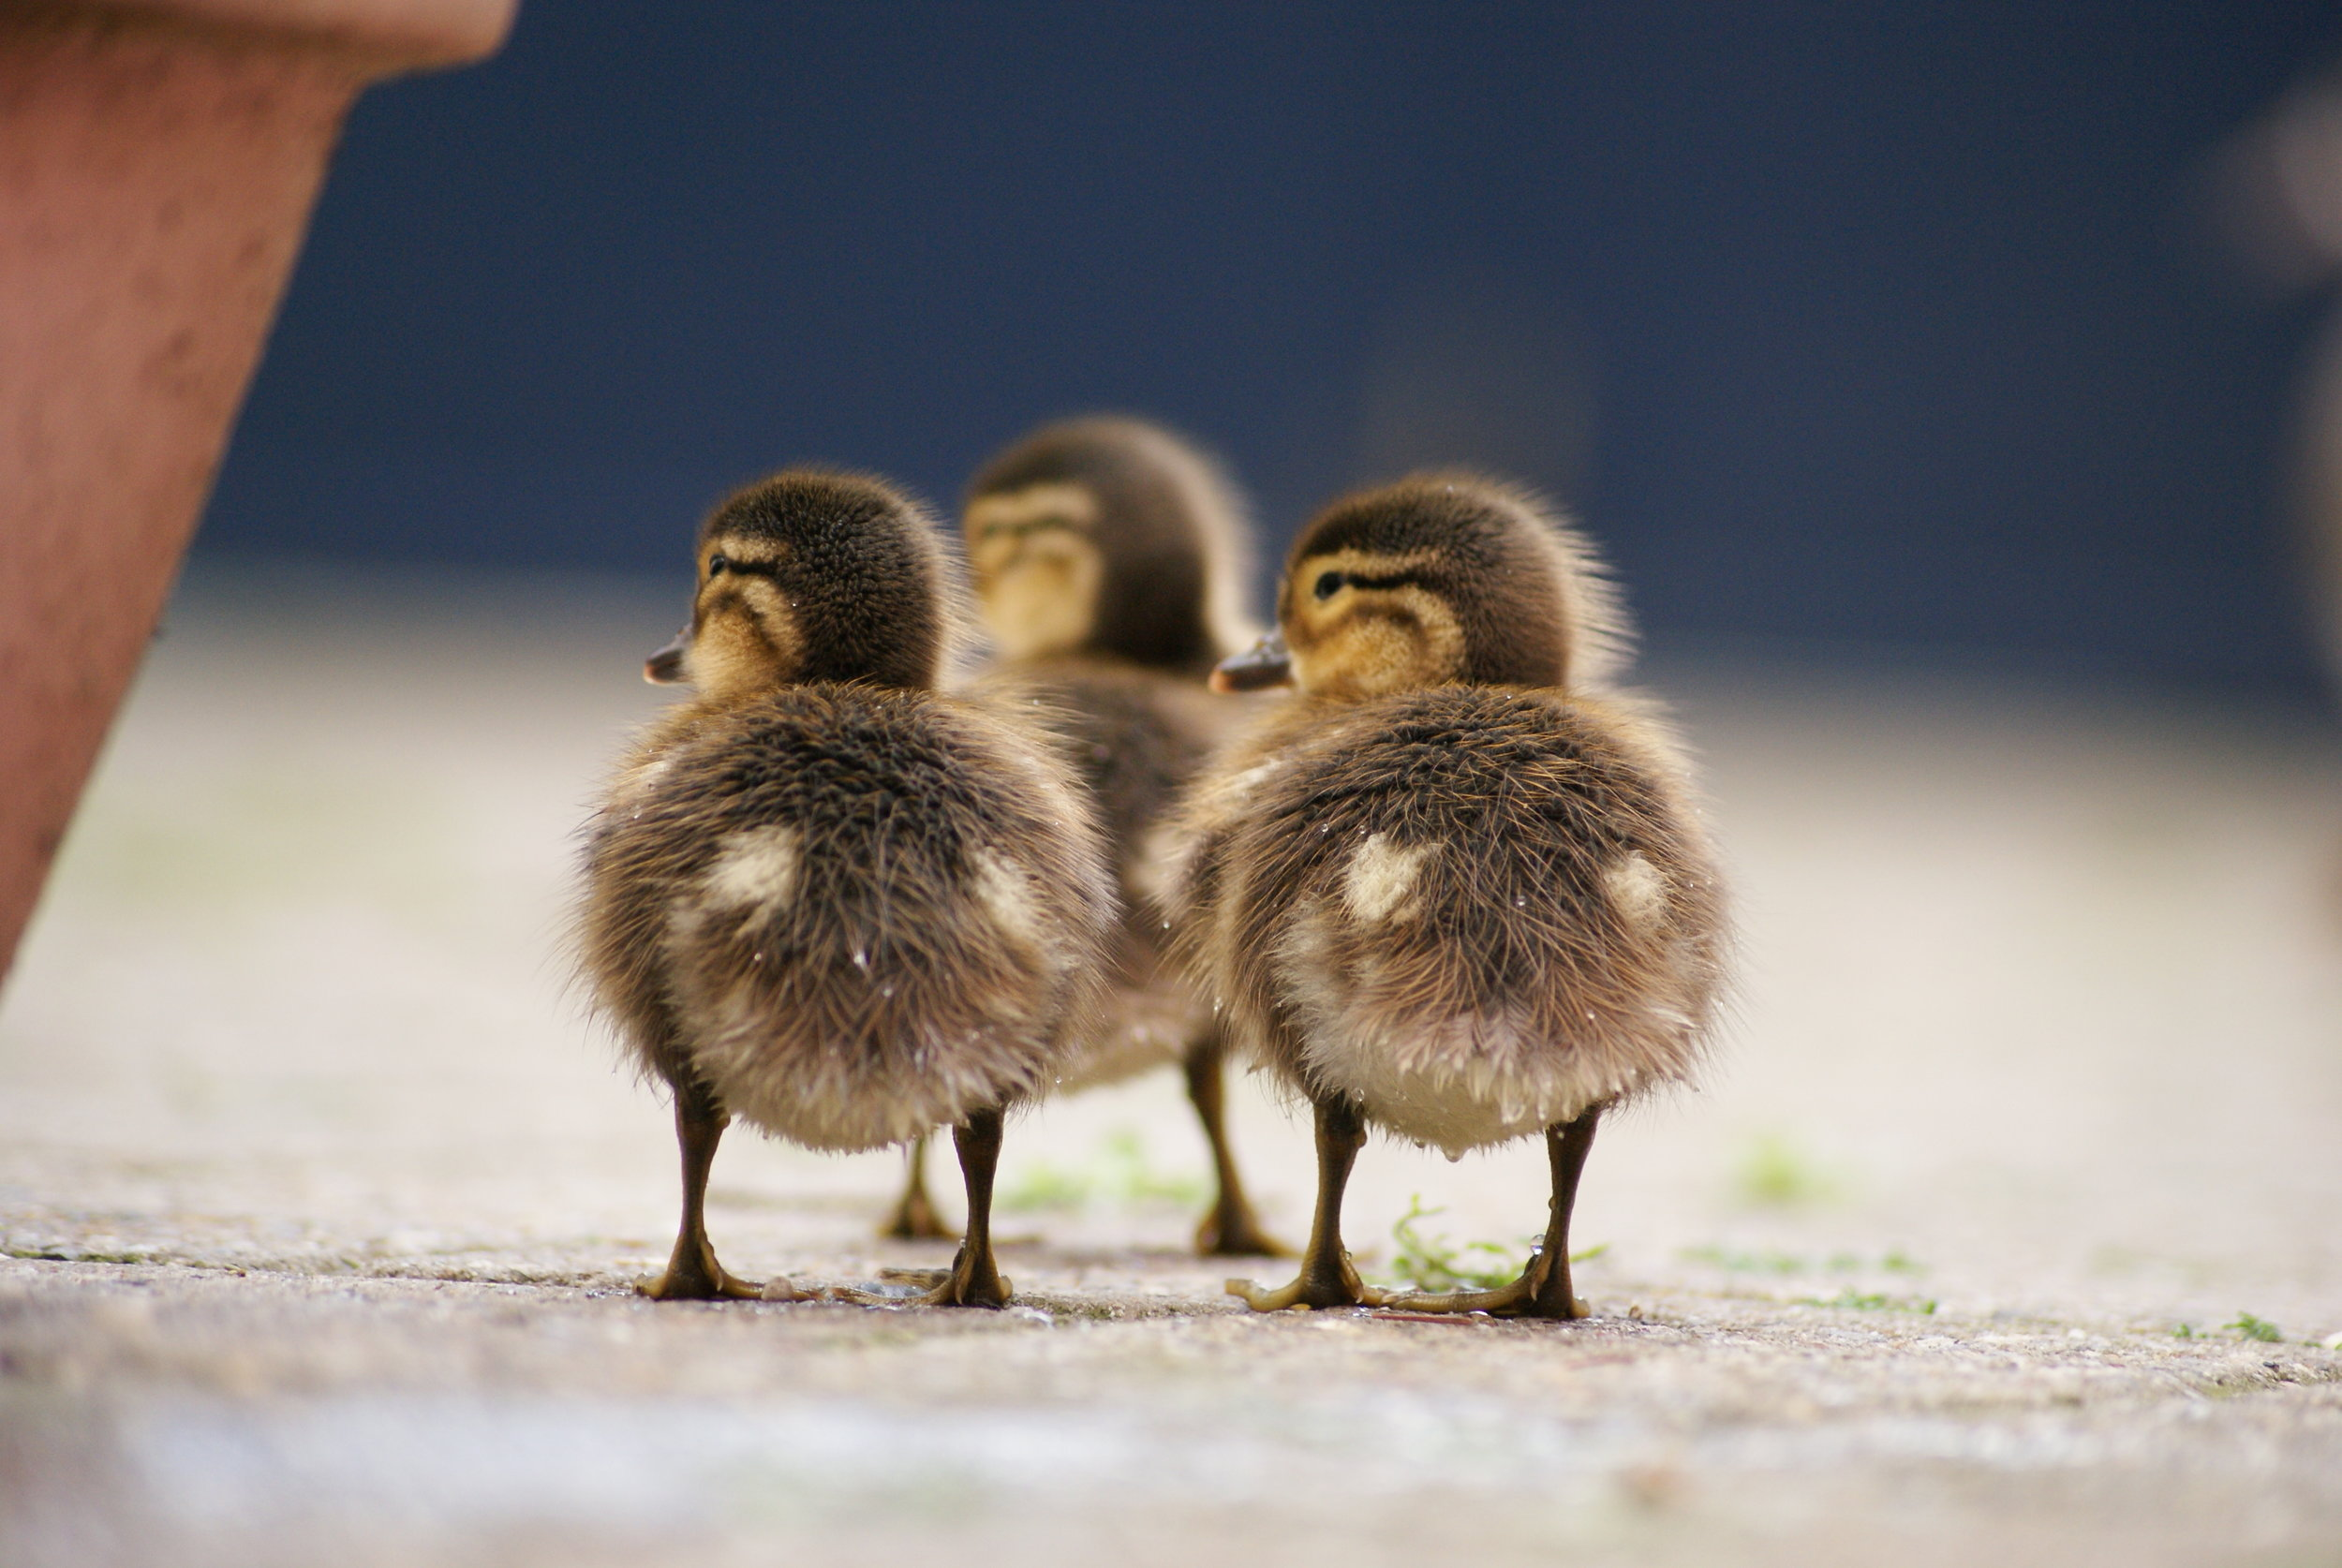 Aix_galericulata_-Belgium_-ducklings-8a.jpg